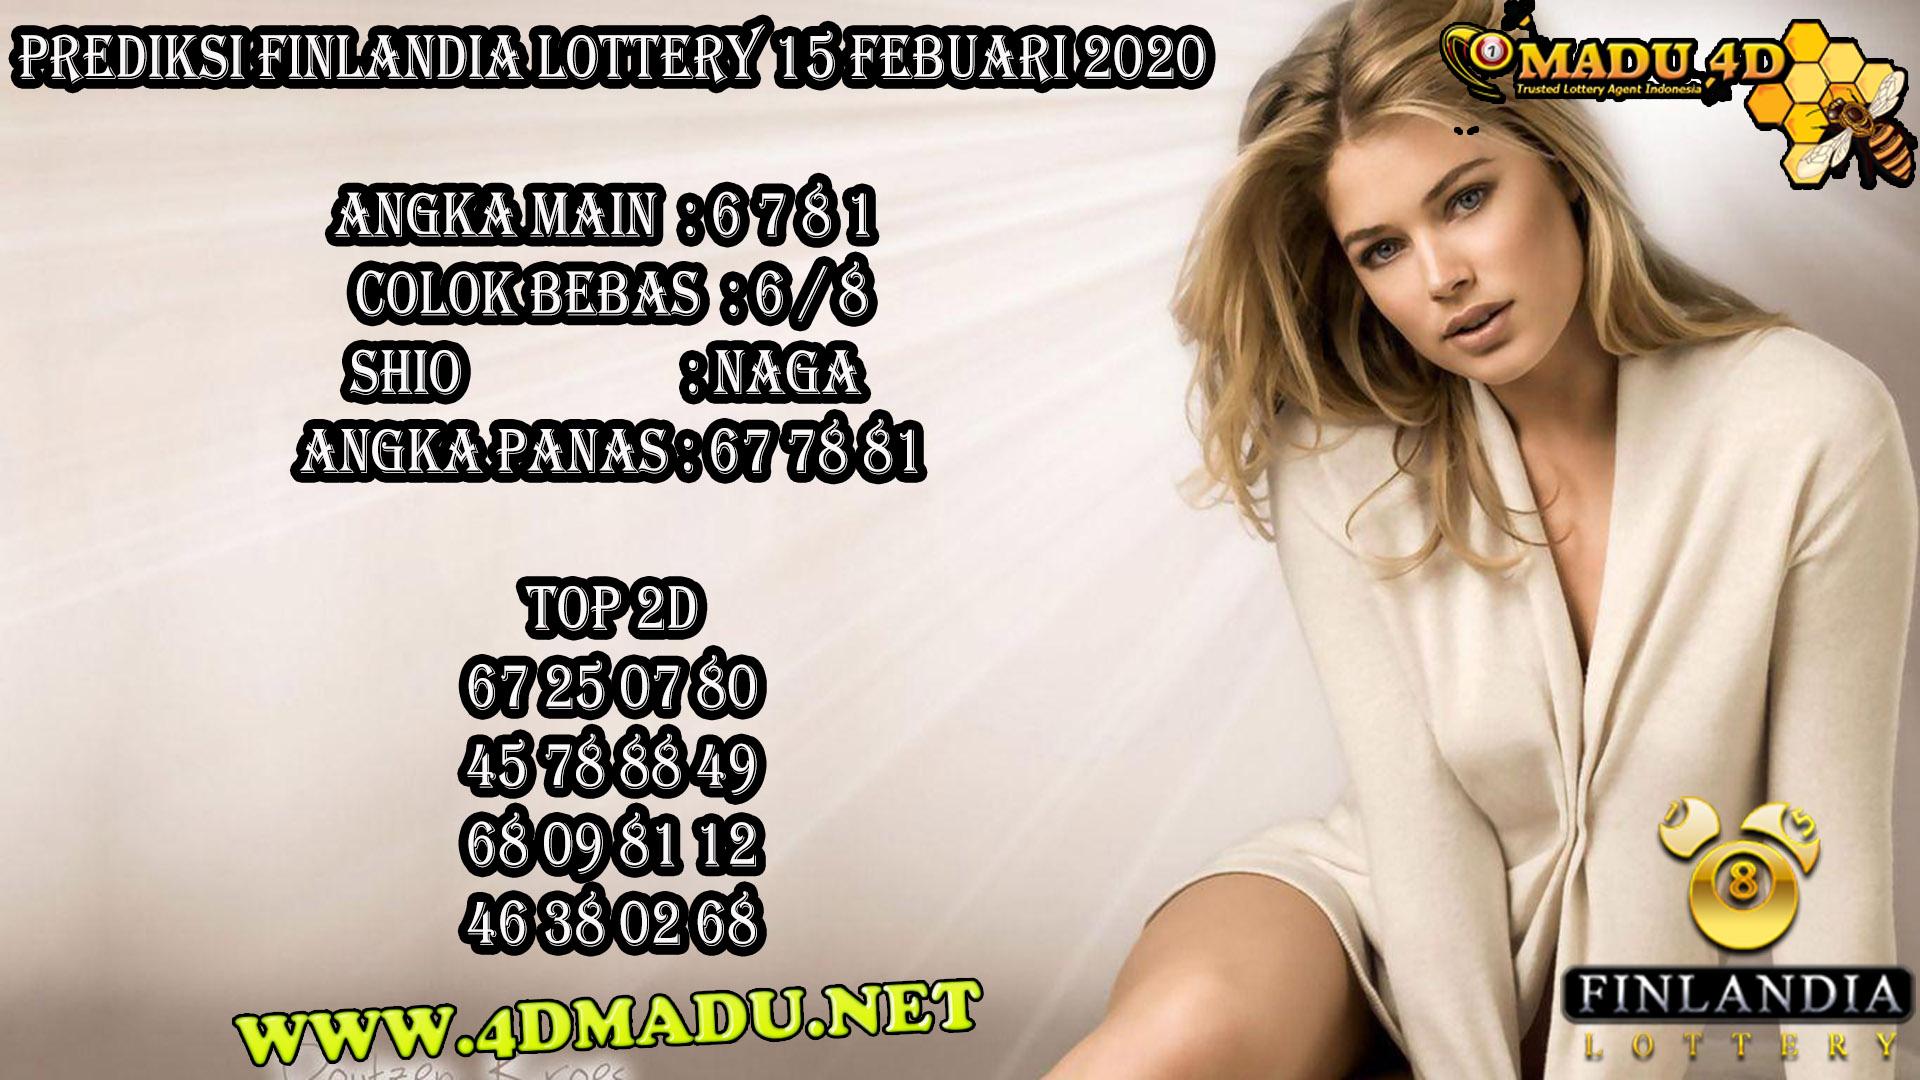 PREDIKSI FINLANDIA LOTTERY 15 FEBUARI 2020